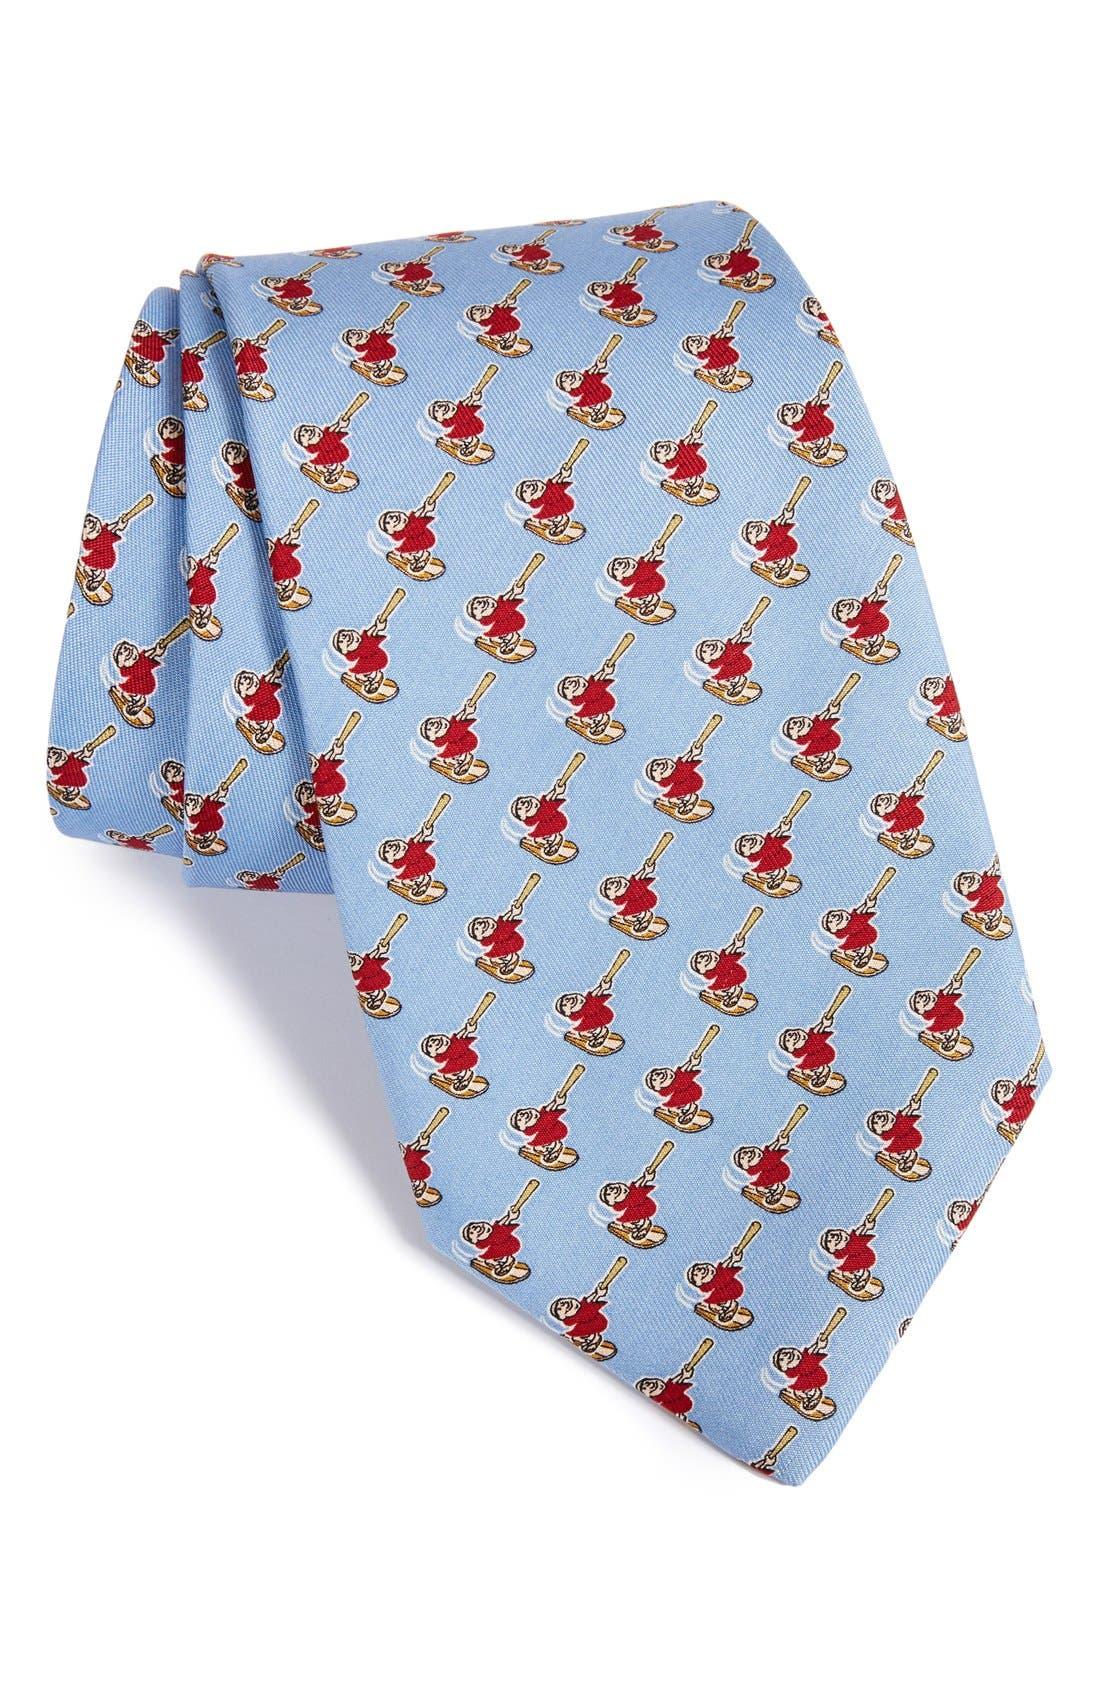 'San Diego Padres - MLB' Print Silk Tie,                         Main,                         color, 450